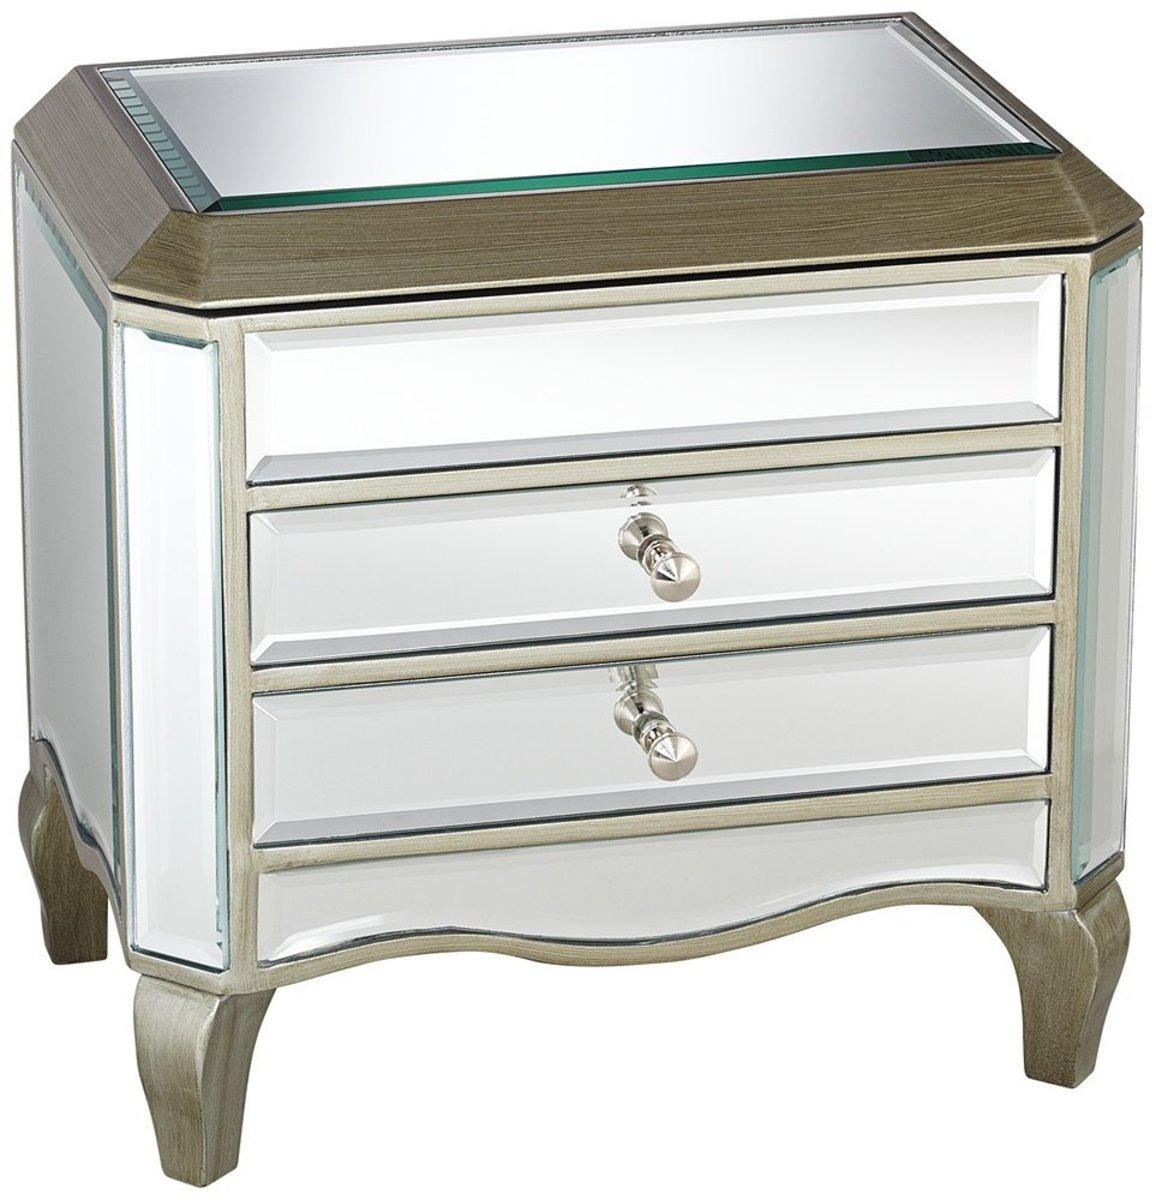 Finley Home Mina Mirrored Jewelry Box